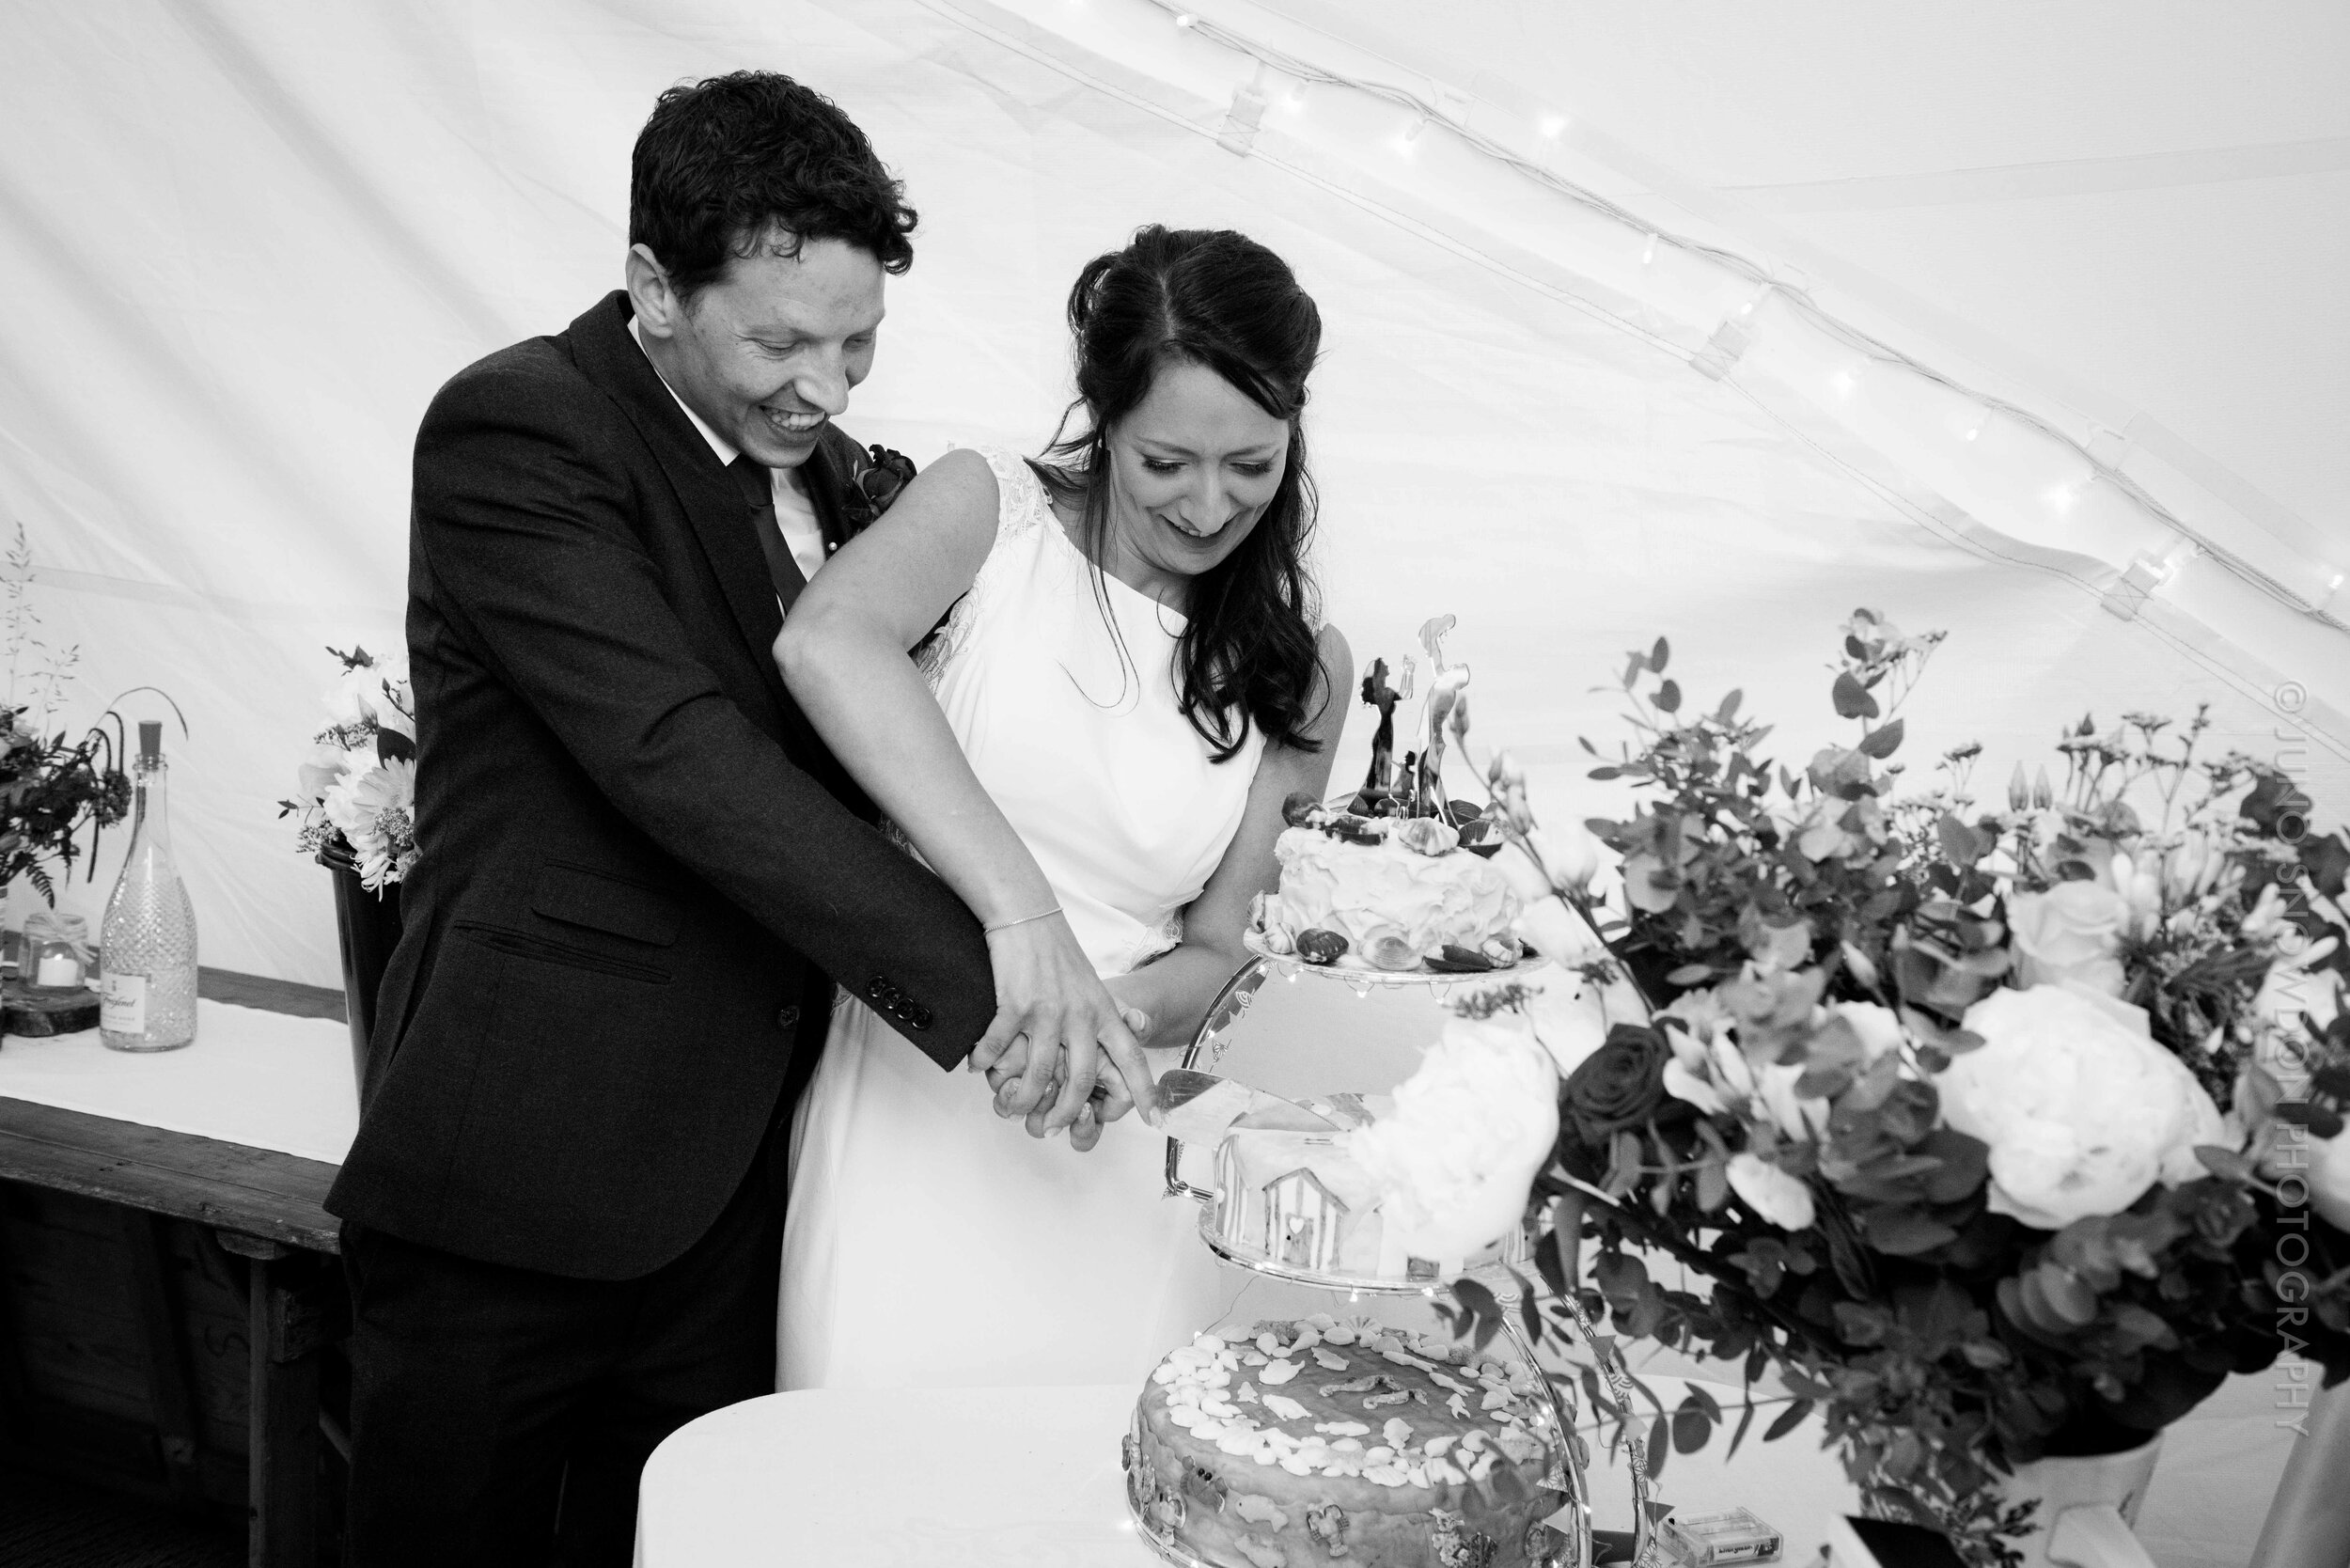 juno-snowdon-photography-wedding-8399.jpg